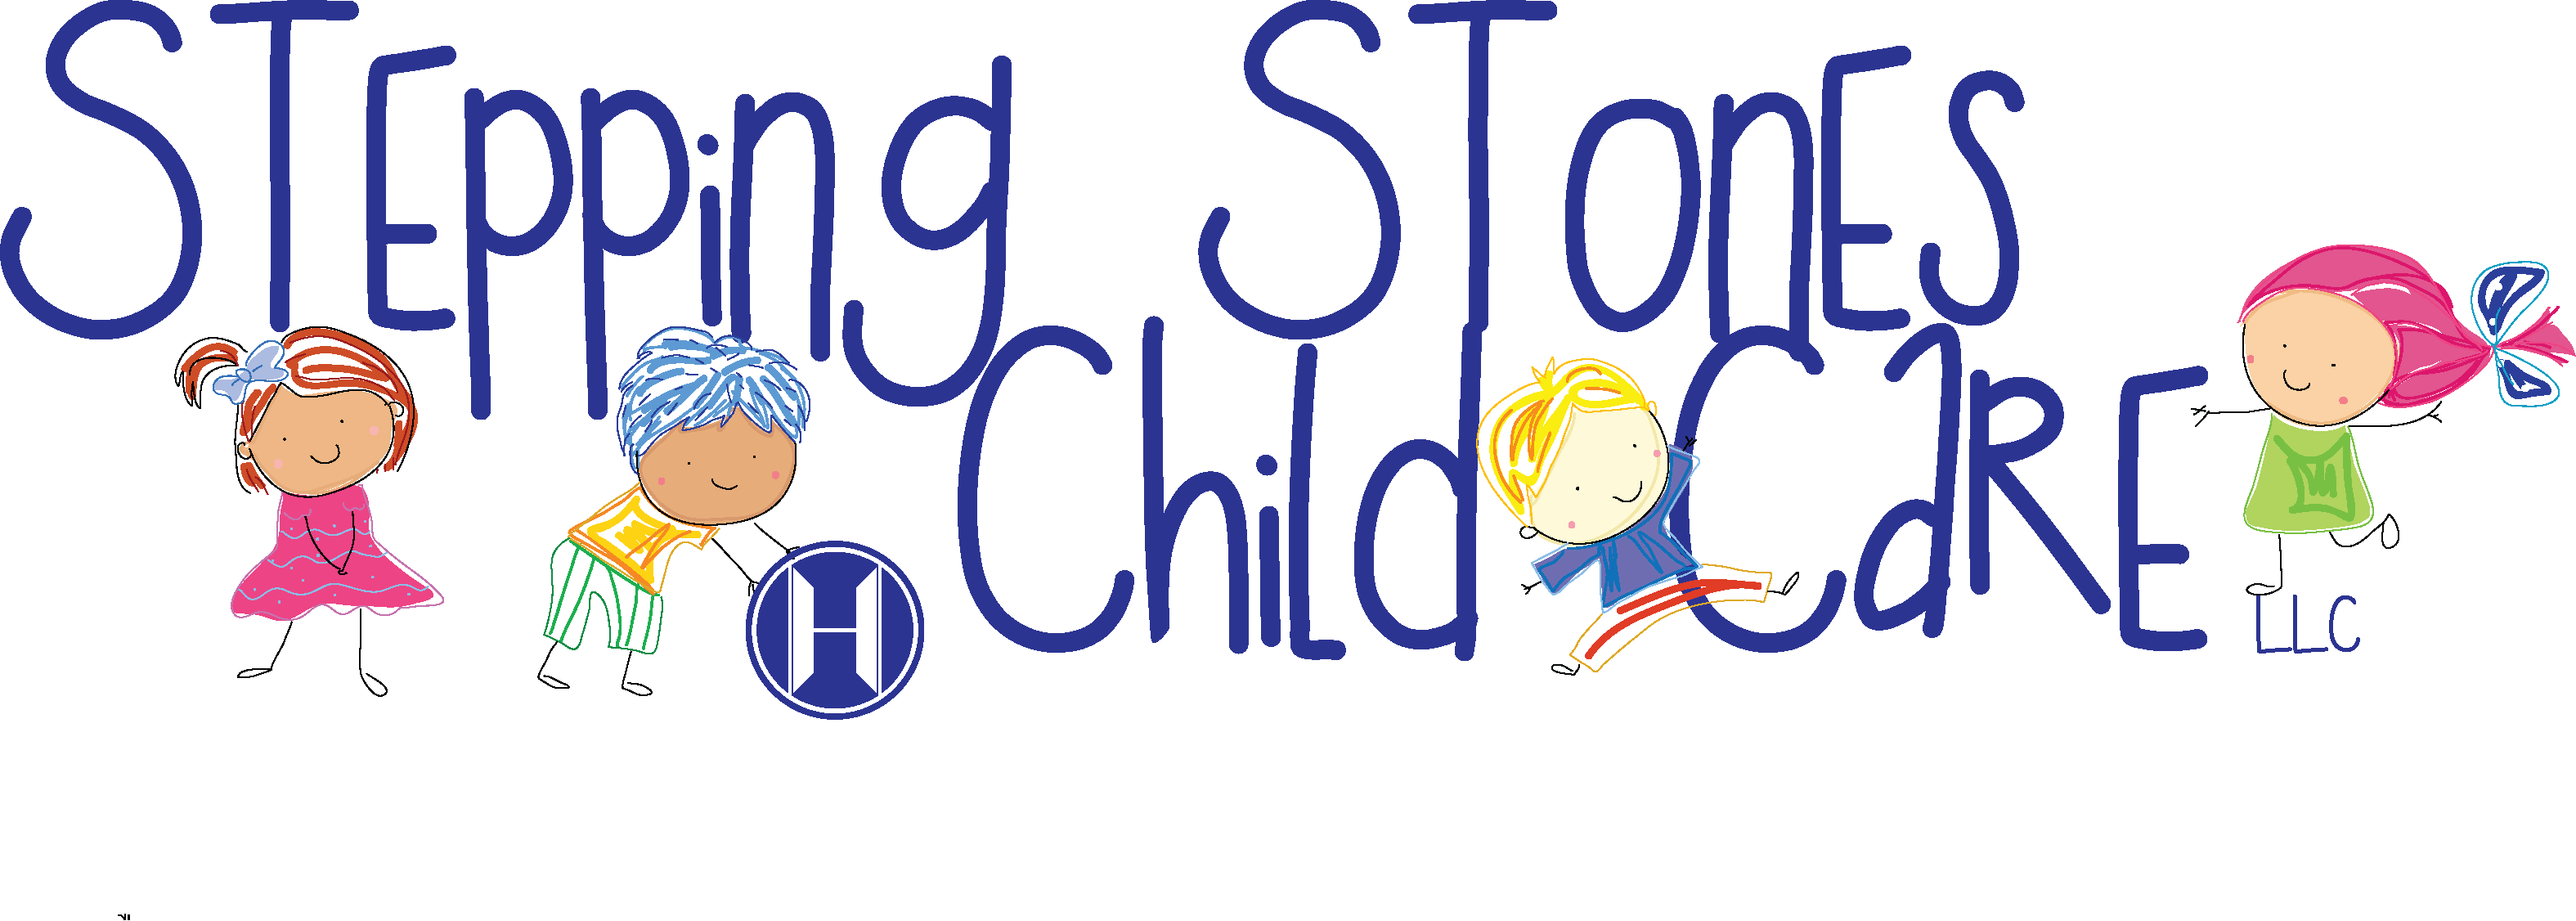 Stepping Stones Childcare Home of Hope Vinita Oklahoma